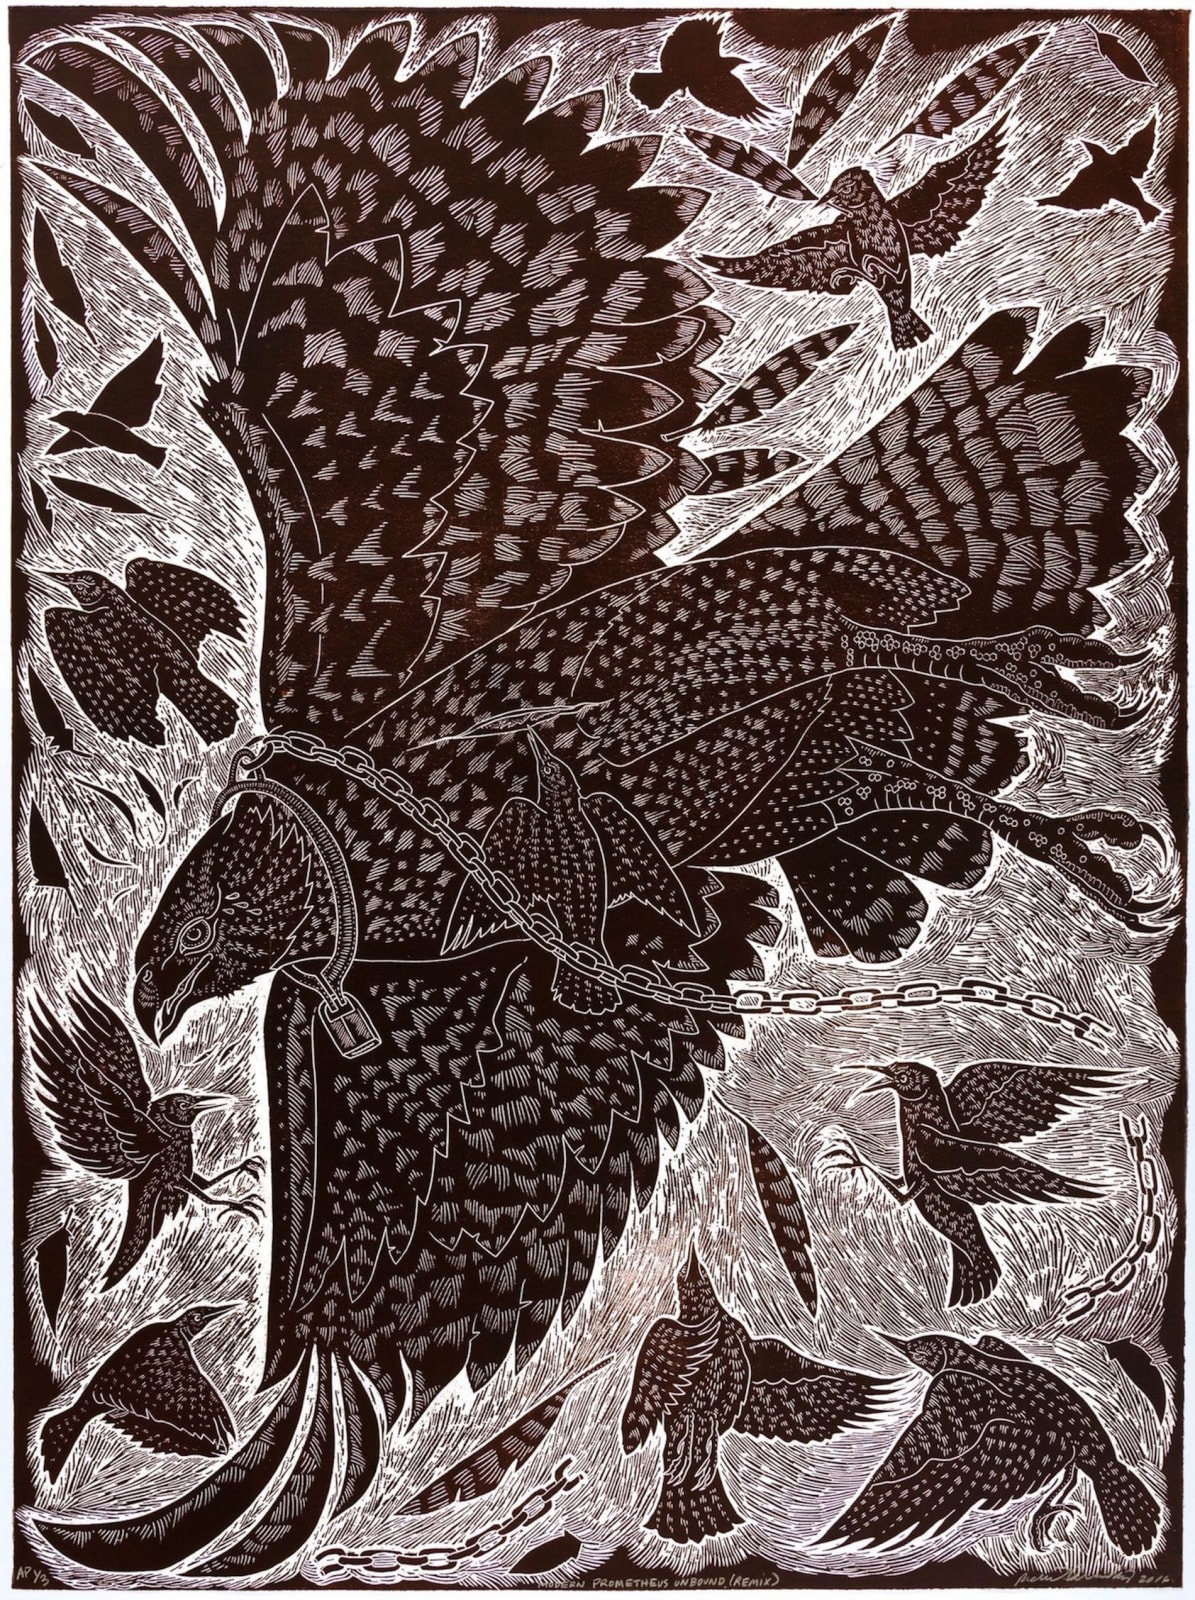 Richard Armendariz Modern Prometheus Unbound (remix), 2015